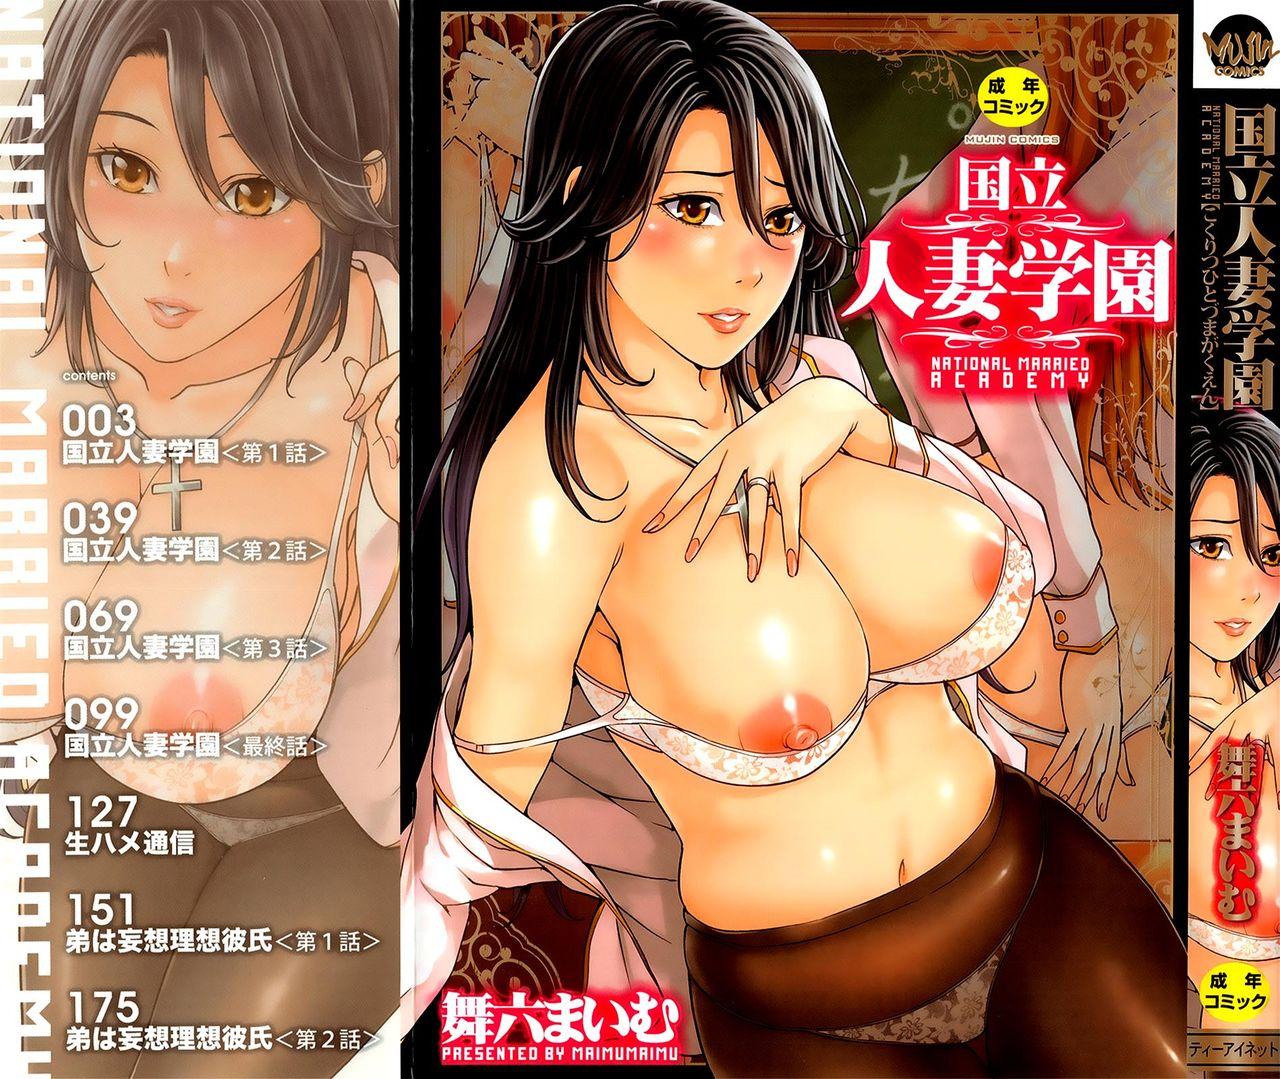 National Married Academy Hentai(English) image 01